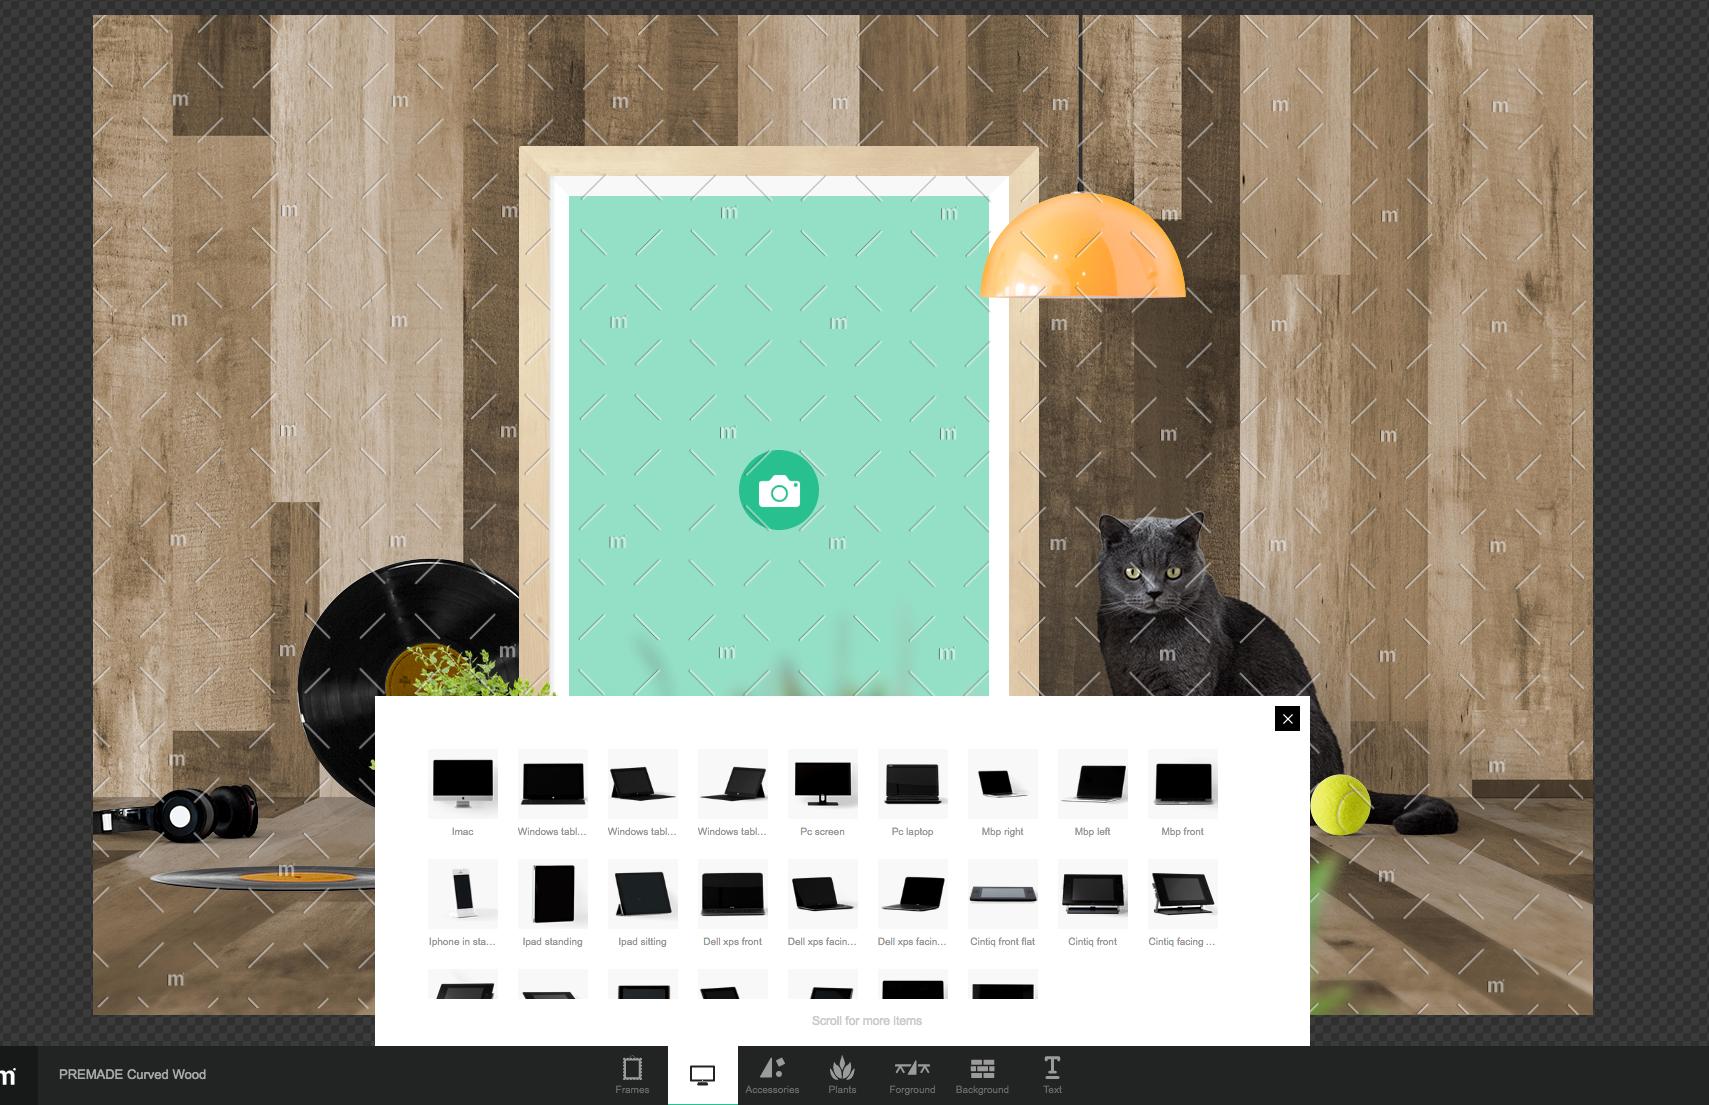 201611_outil-mockup-editor-1